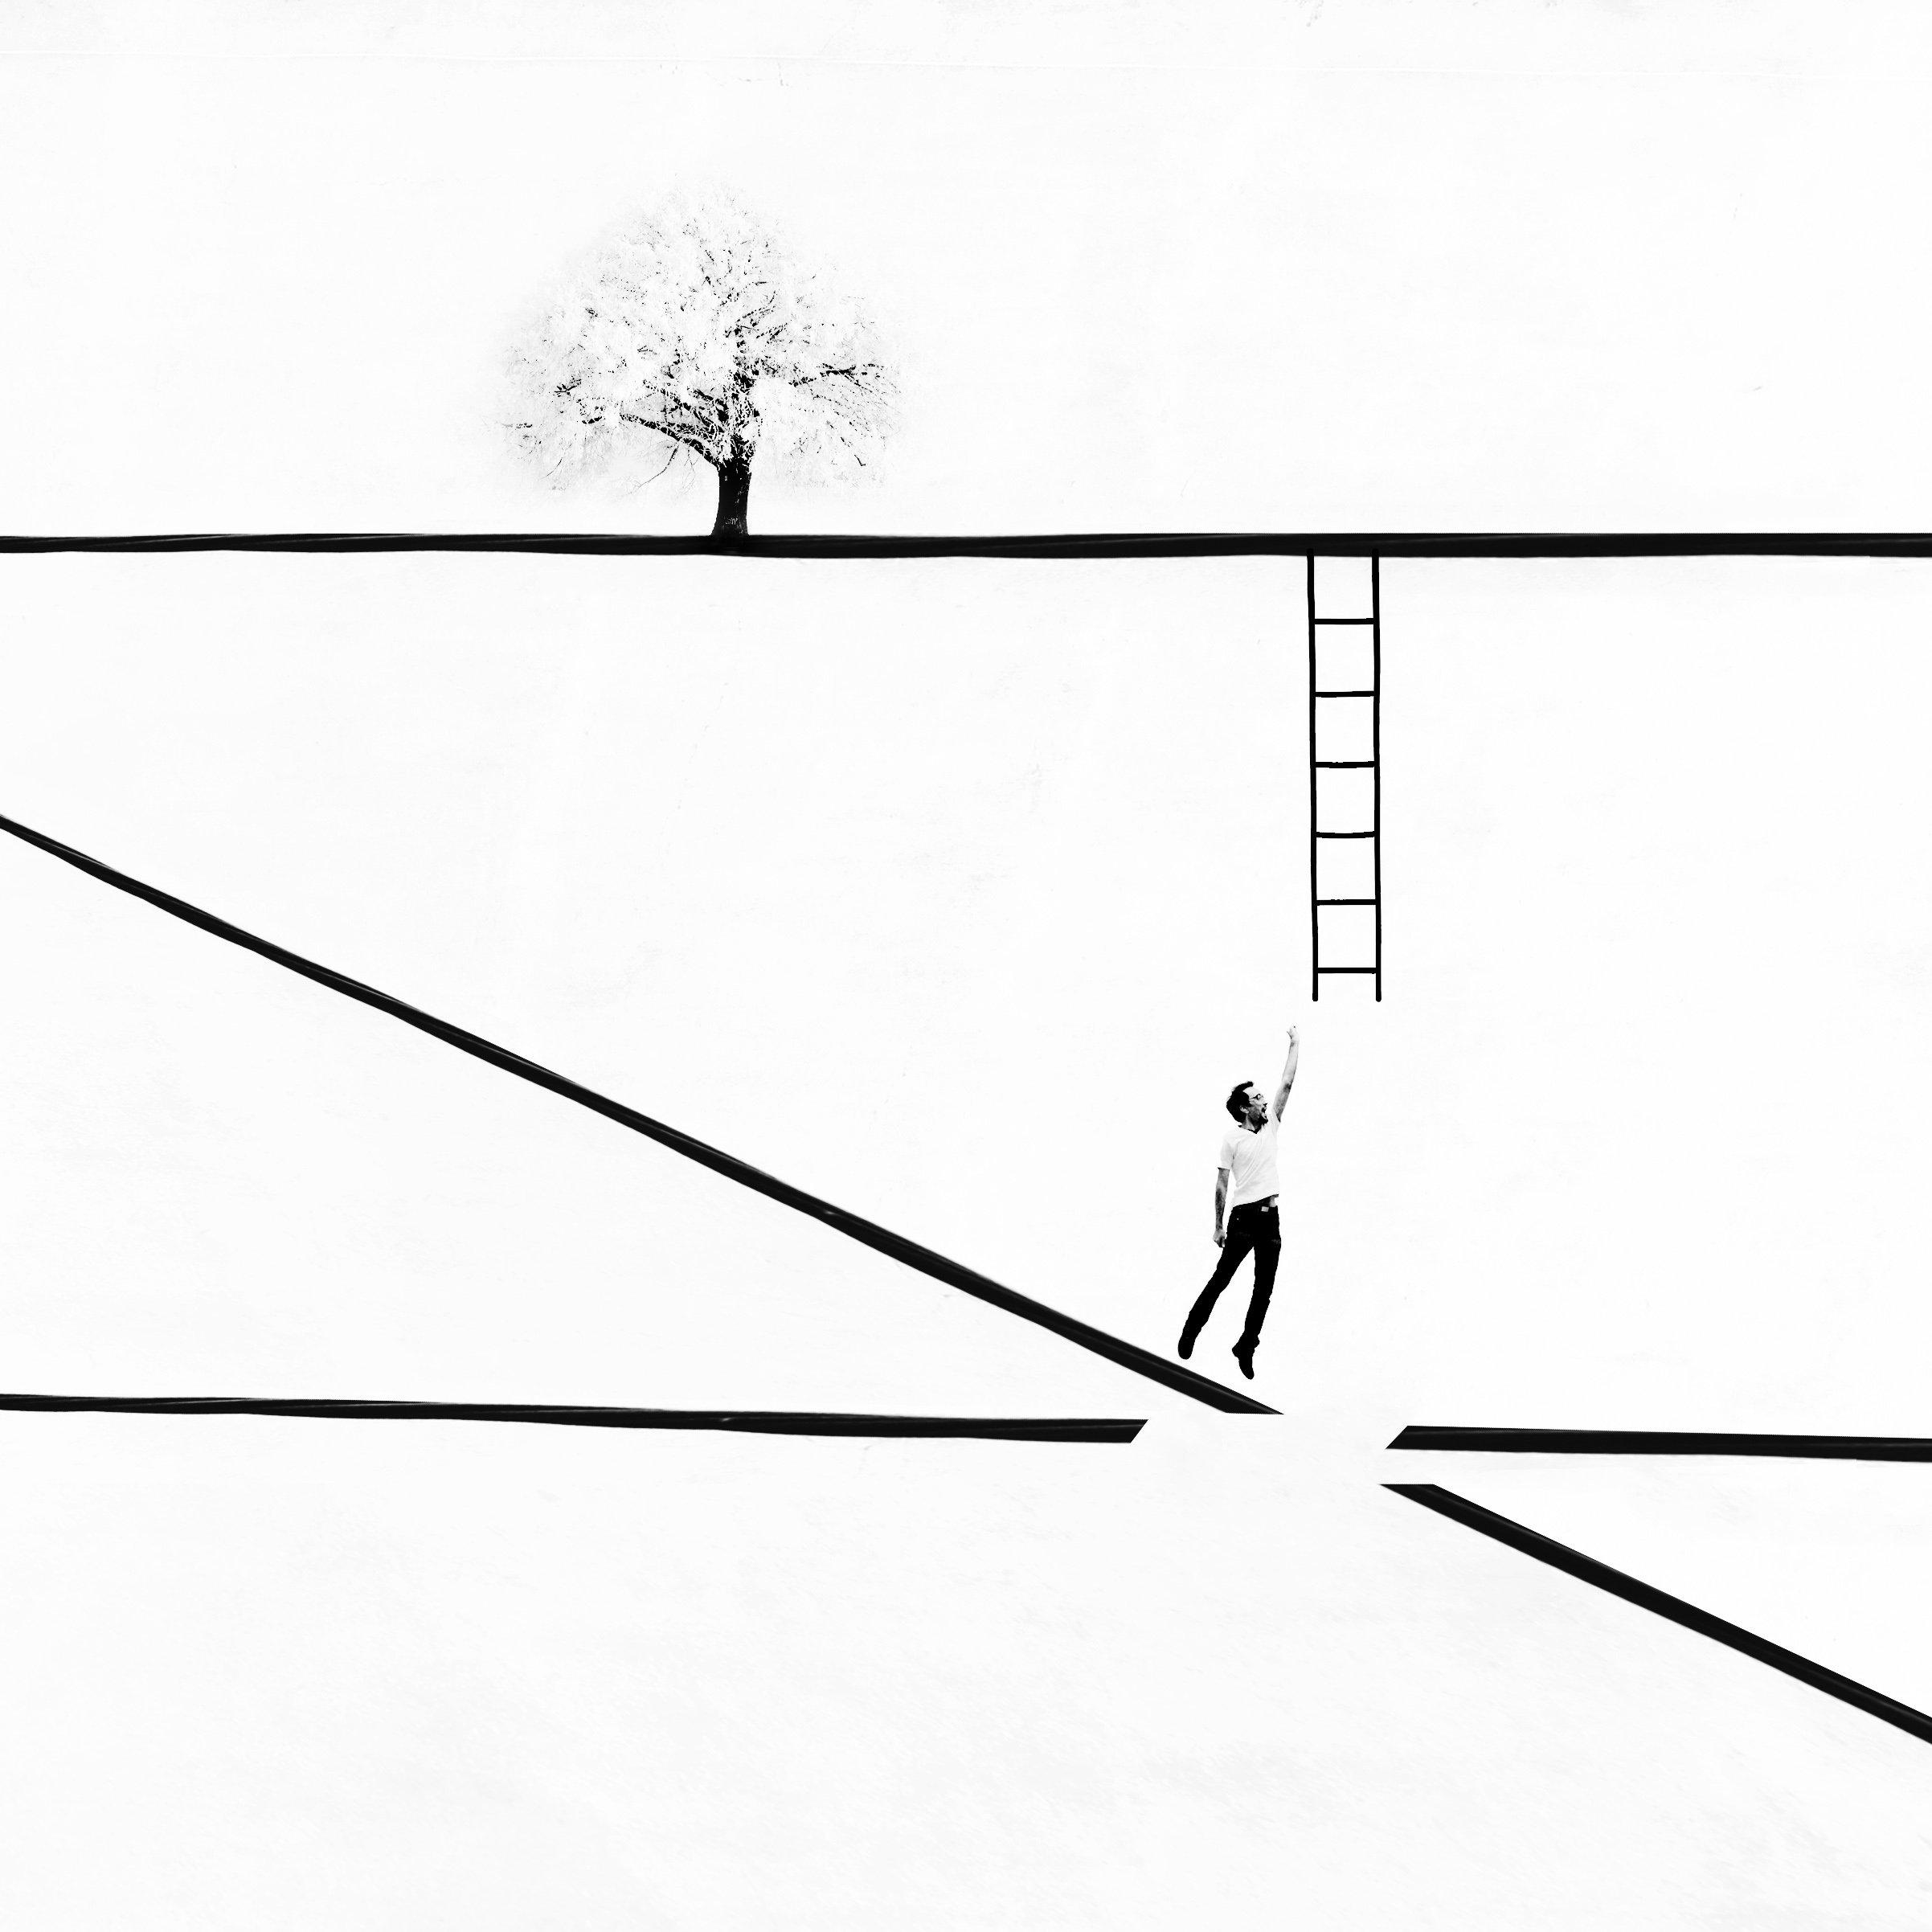 conceptual, fine art, tree, ladder, minimal, photography, lines, milad safabakhsh